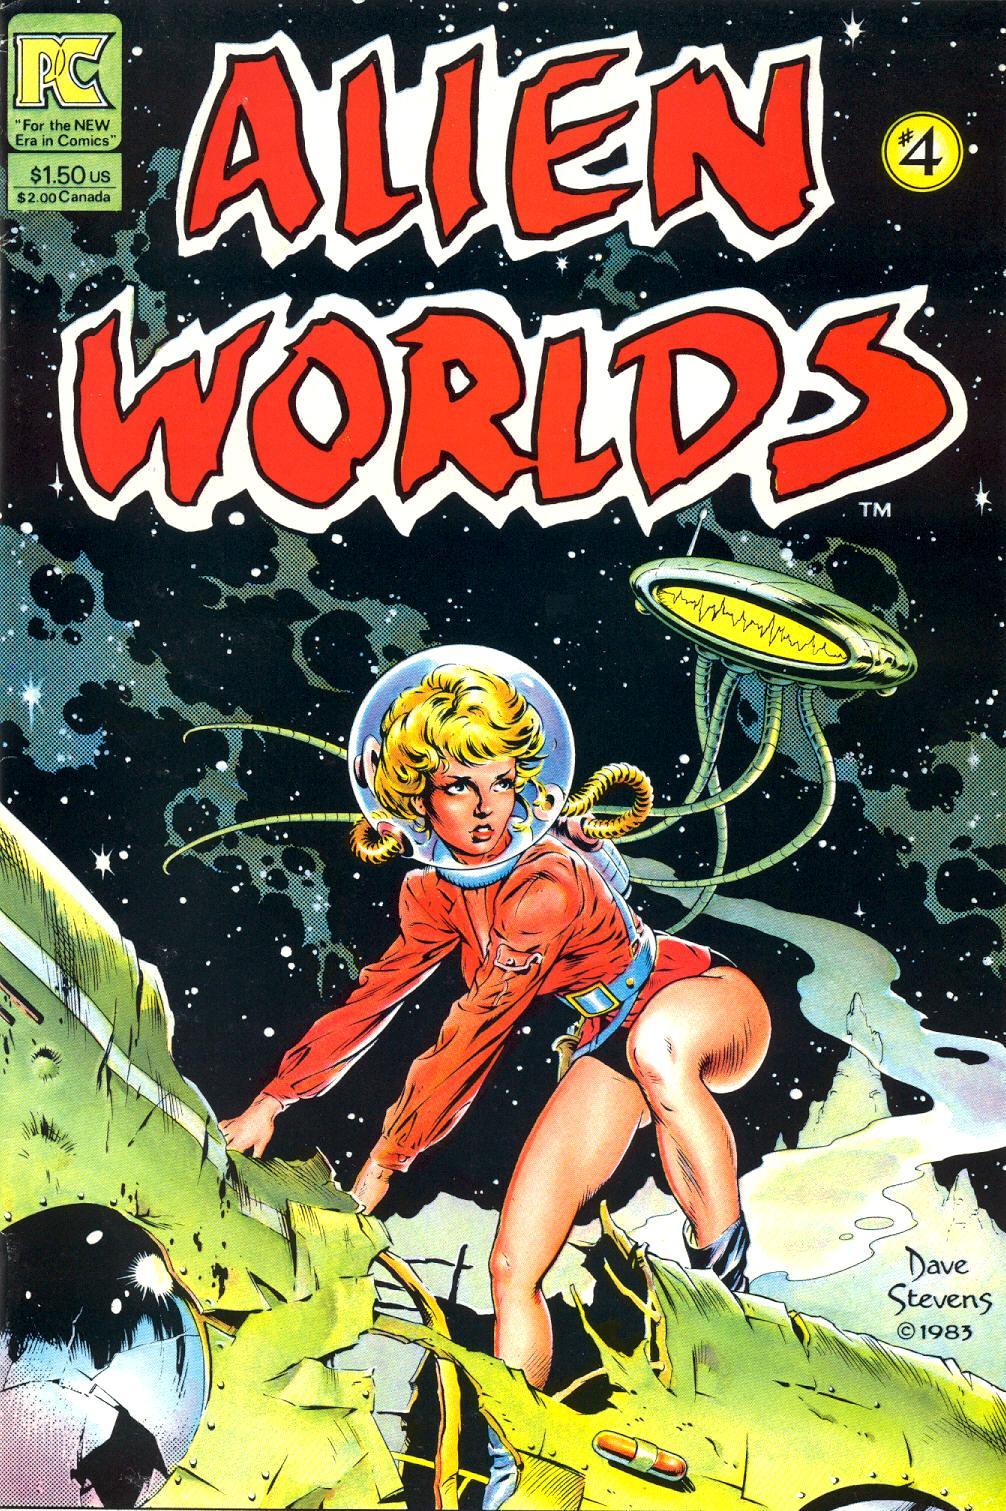 Alien Worlds 4 Page 1